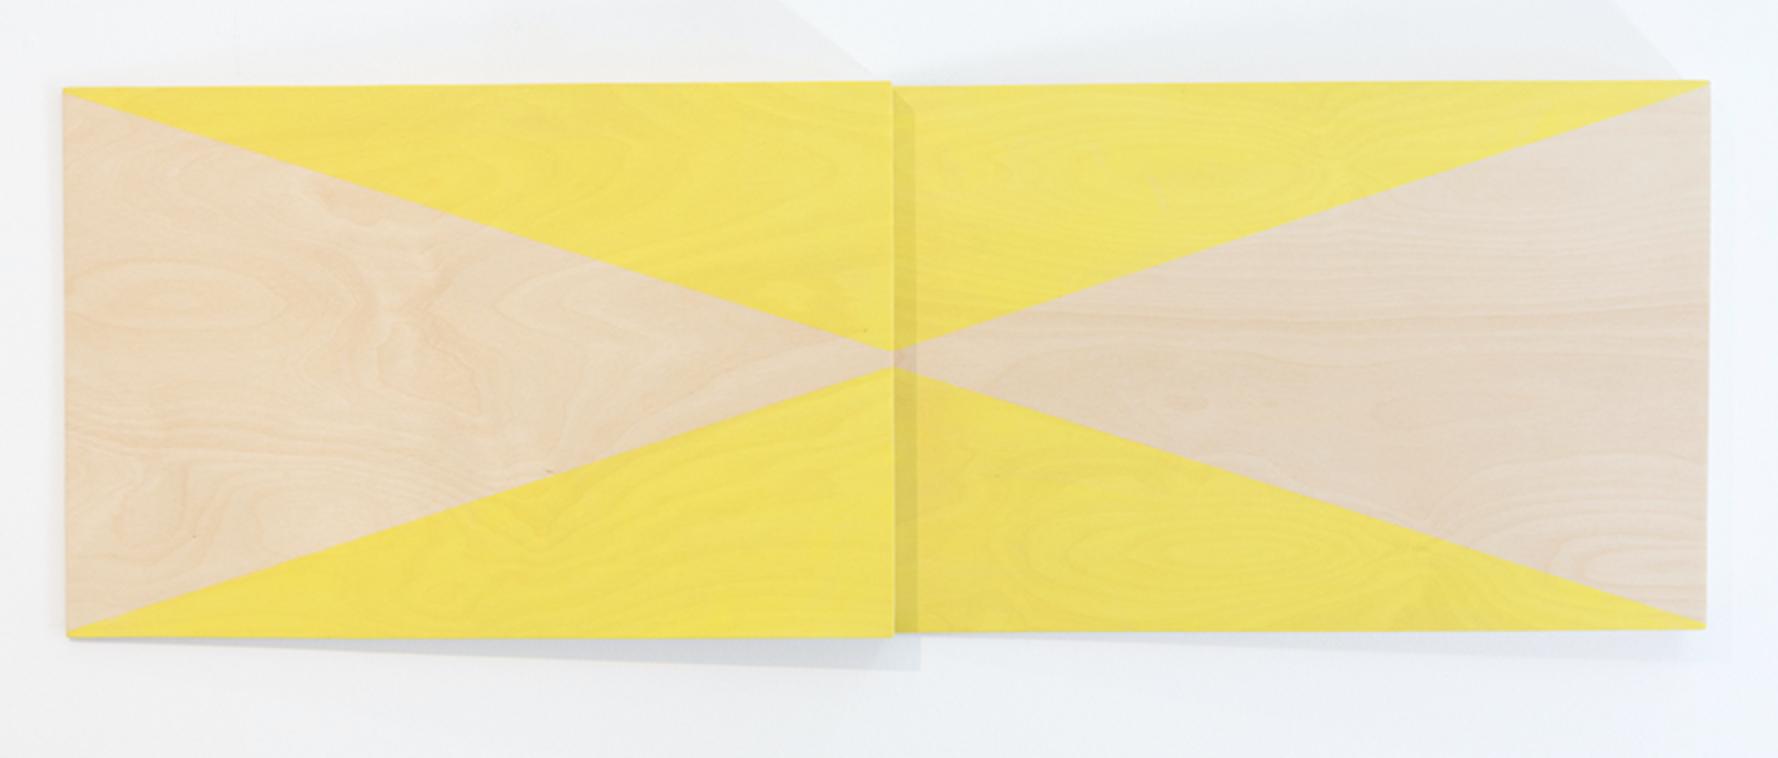 VIRGINIA COVENTRY  Test Piece - Lemon Yellow,  2018 acrylic on plywood 2 Panels 40 x 60 cm each